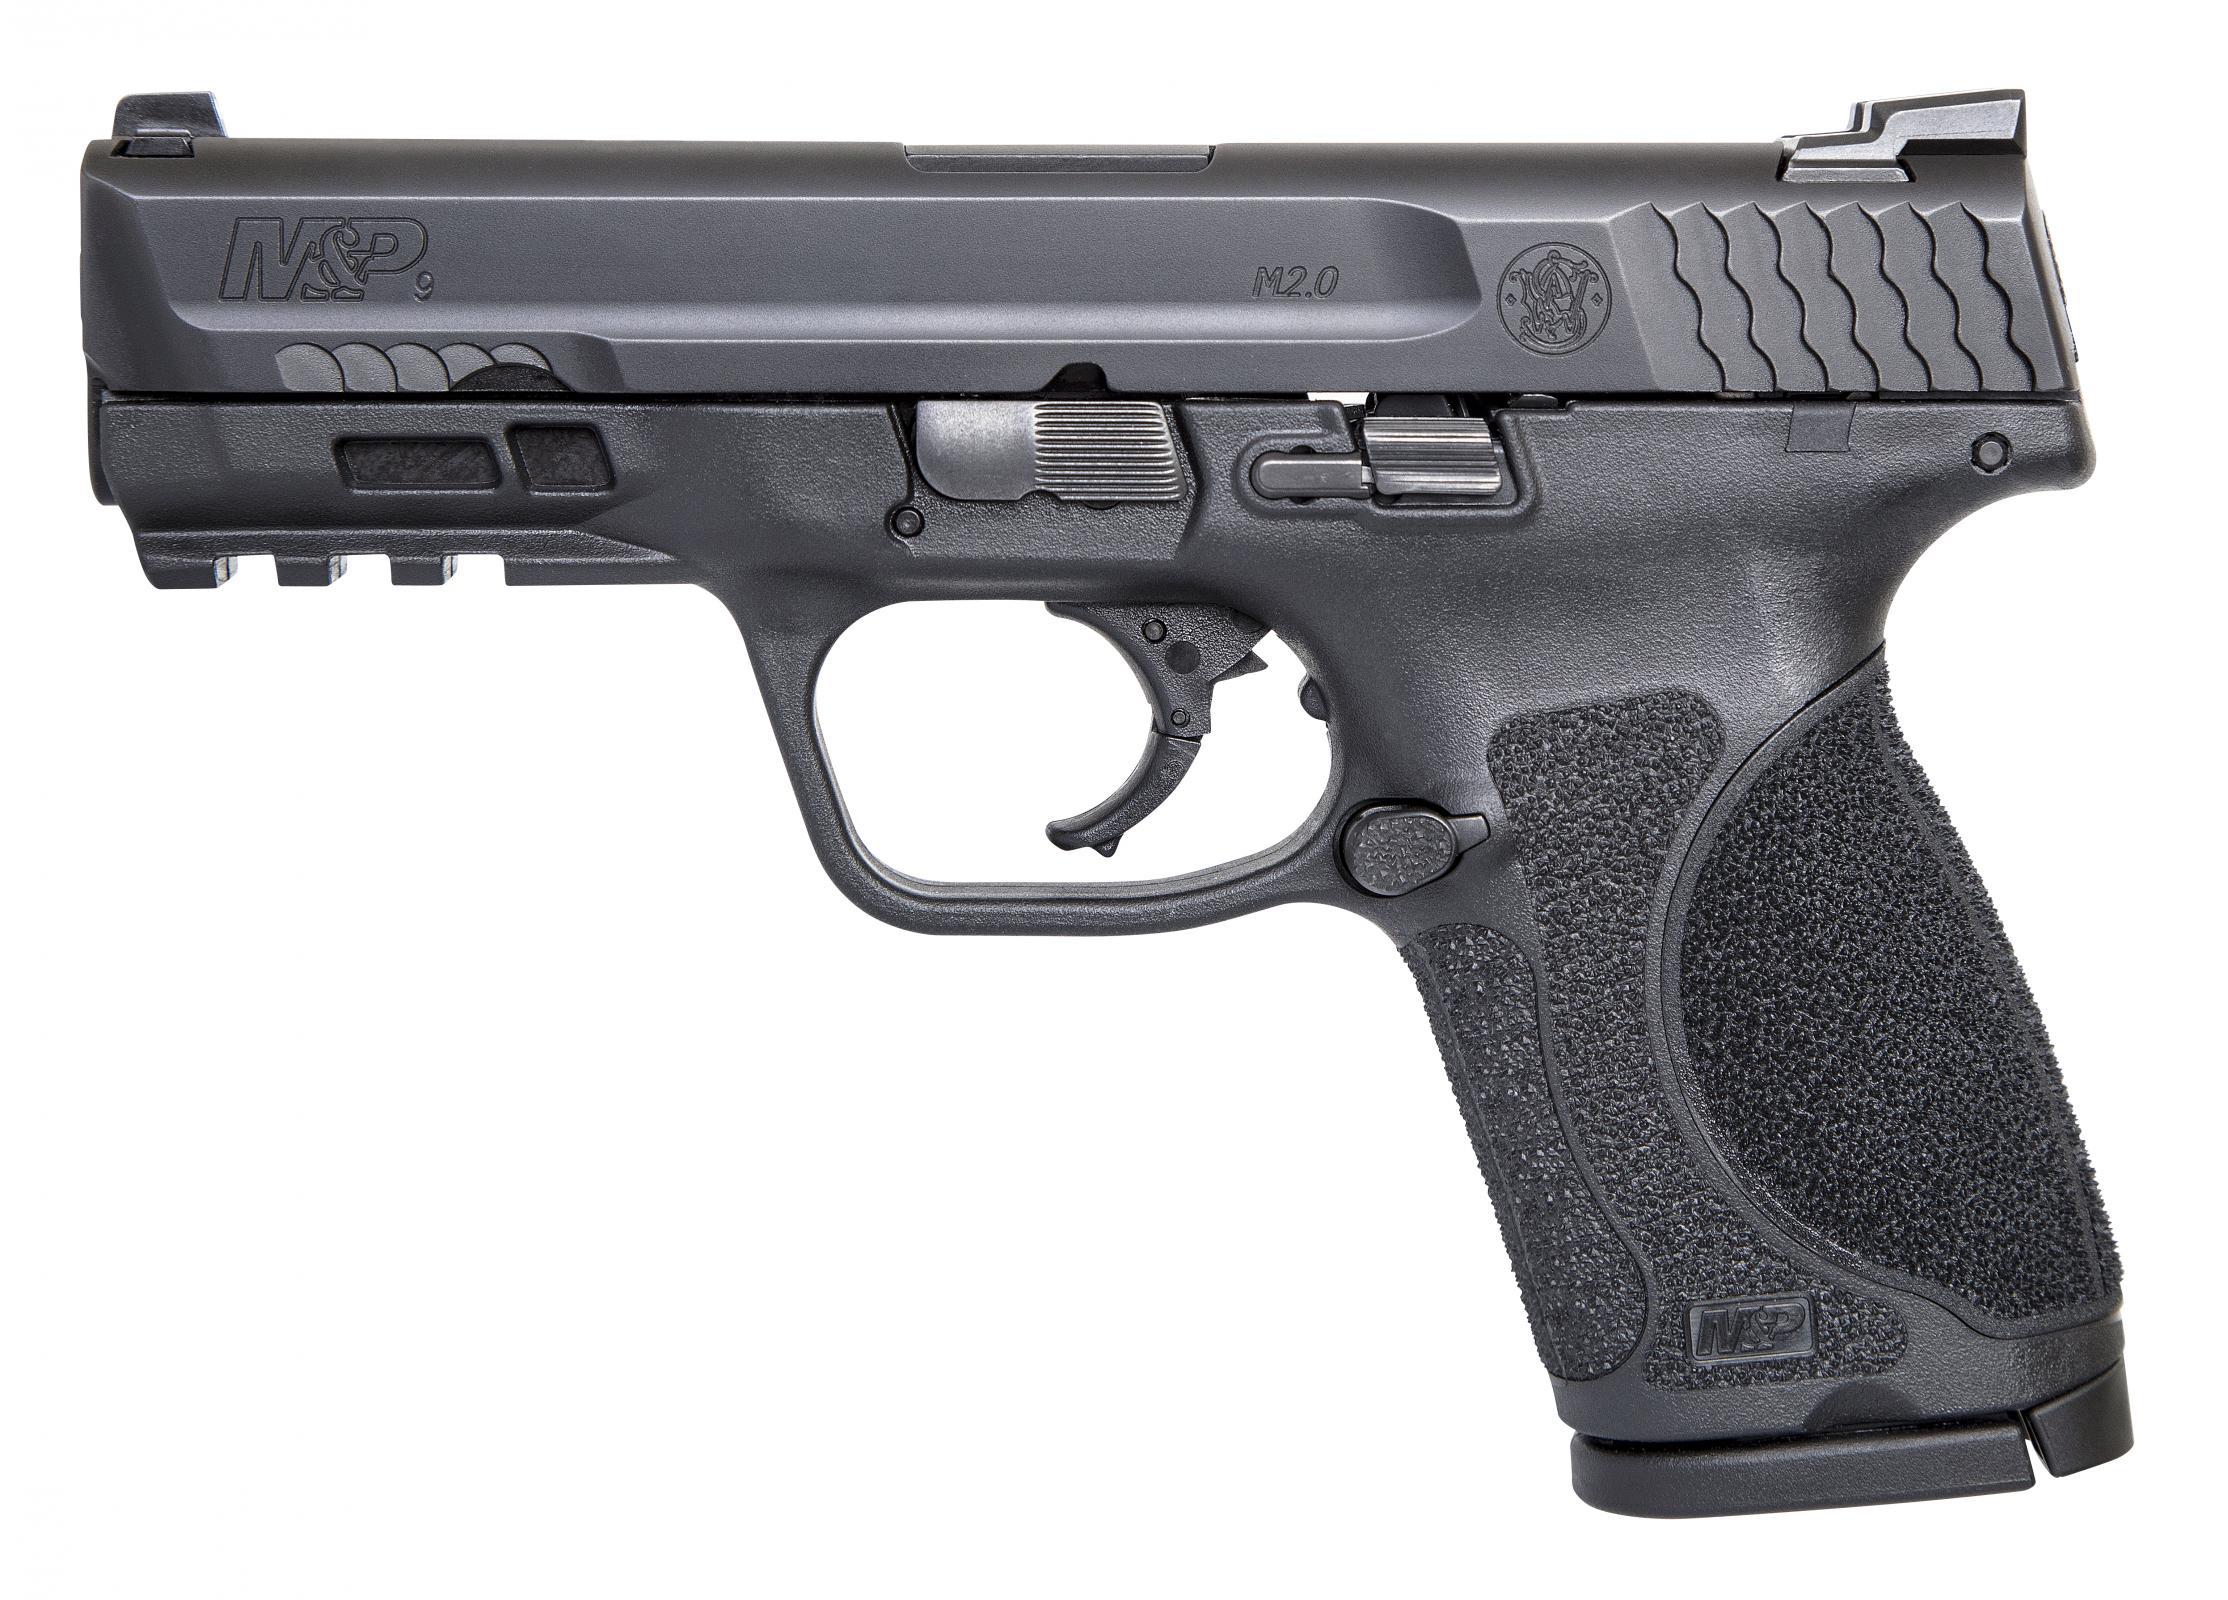 Smith & Wesson M&P9 M2.0 Compact 9mm Pistol, Black (11683)